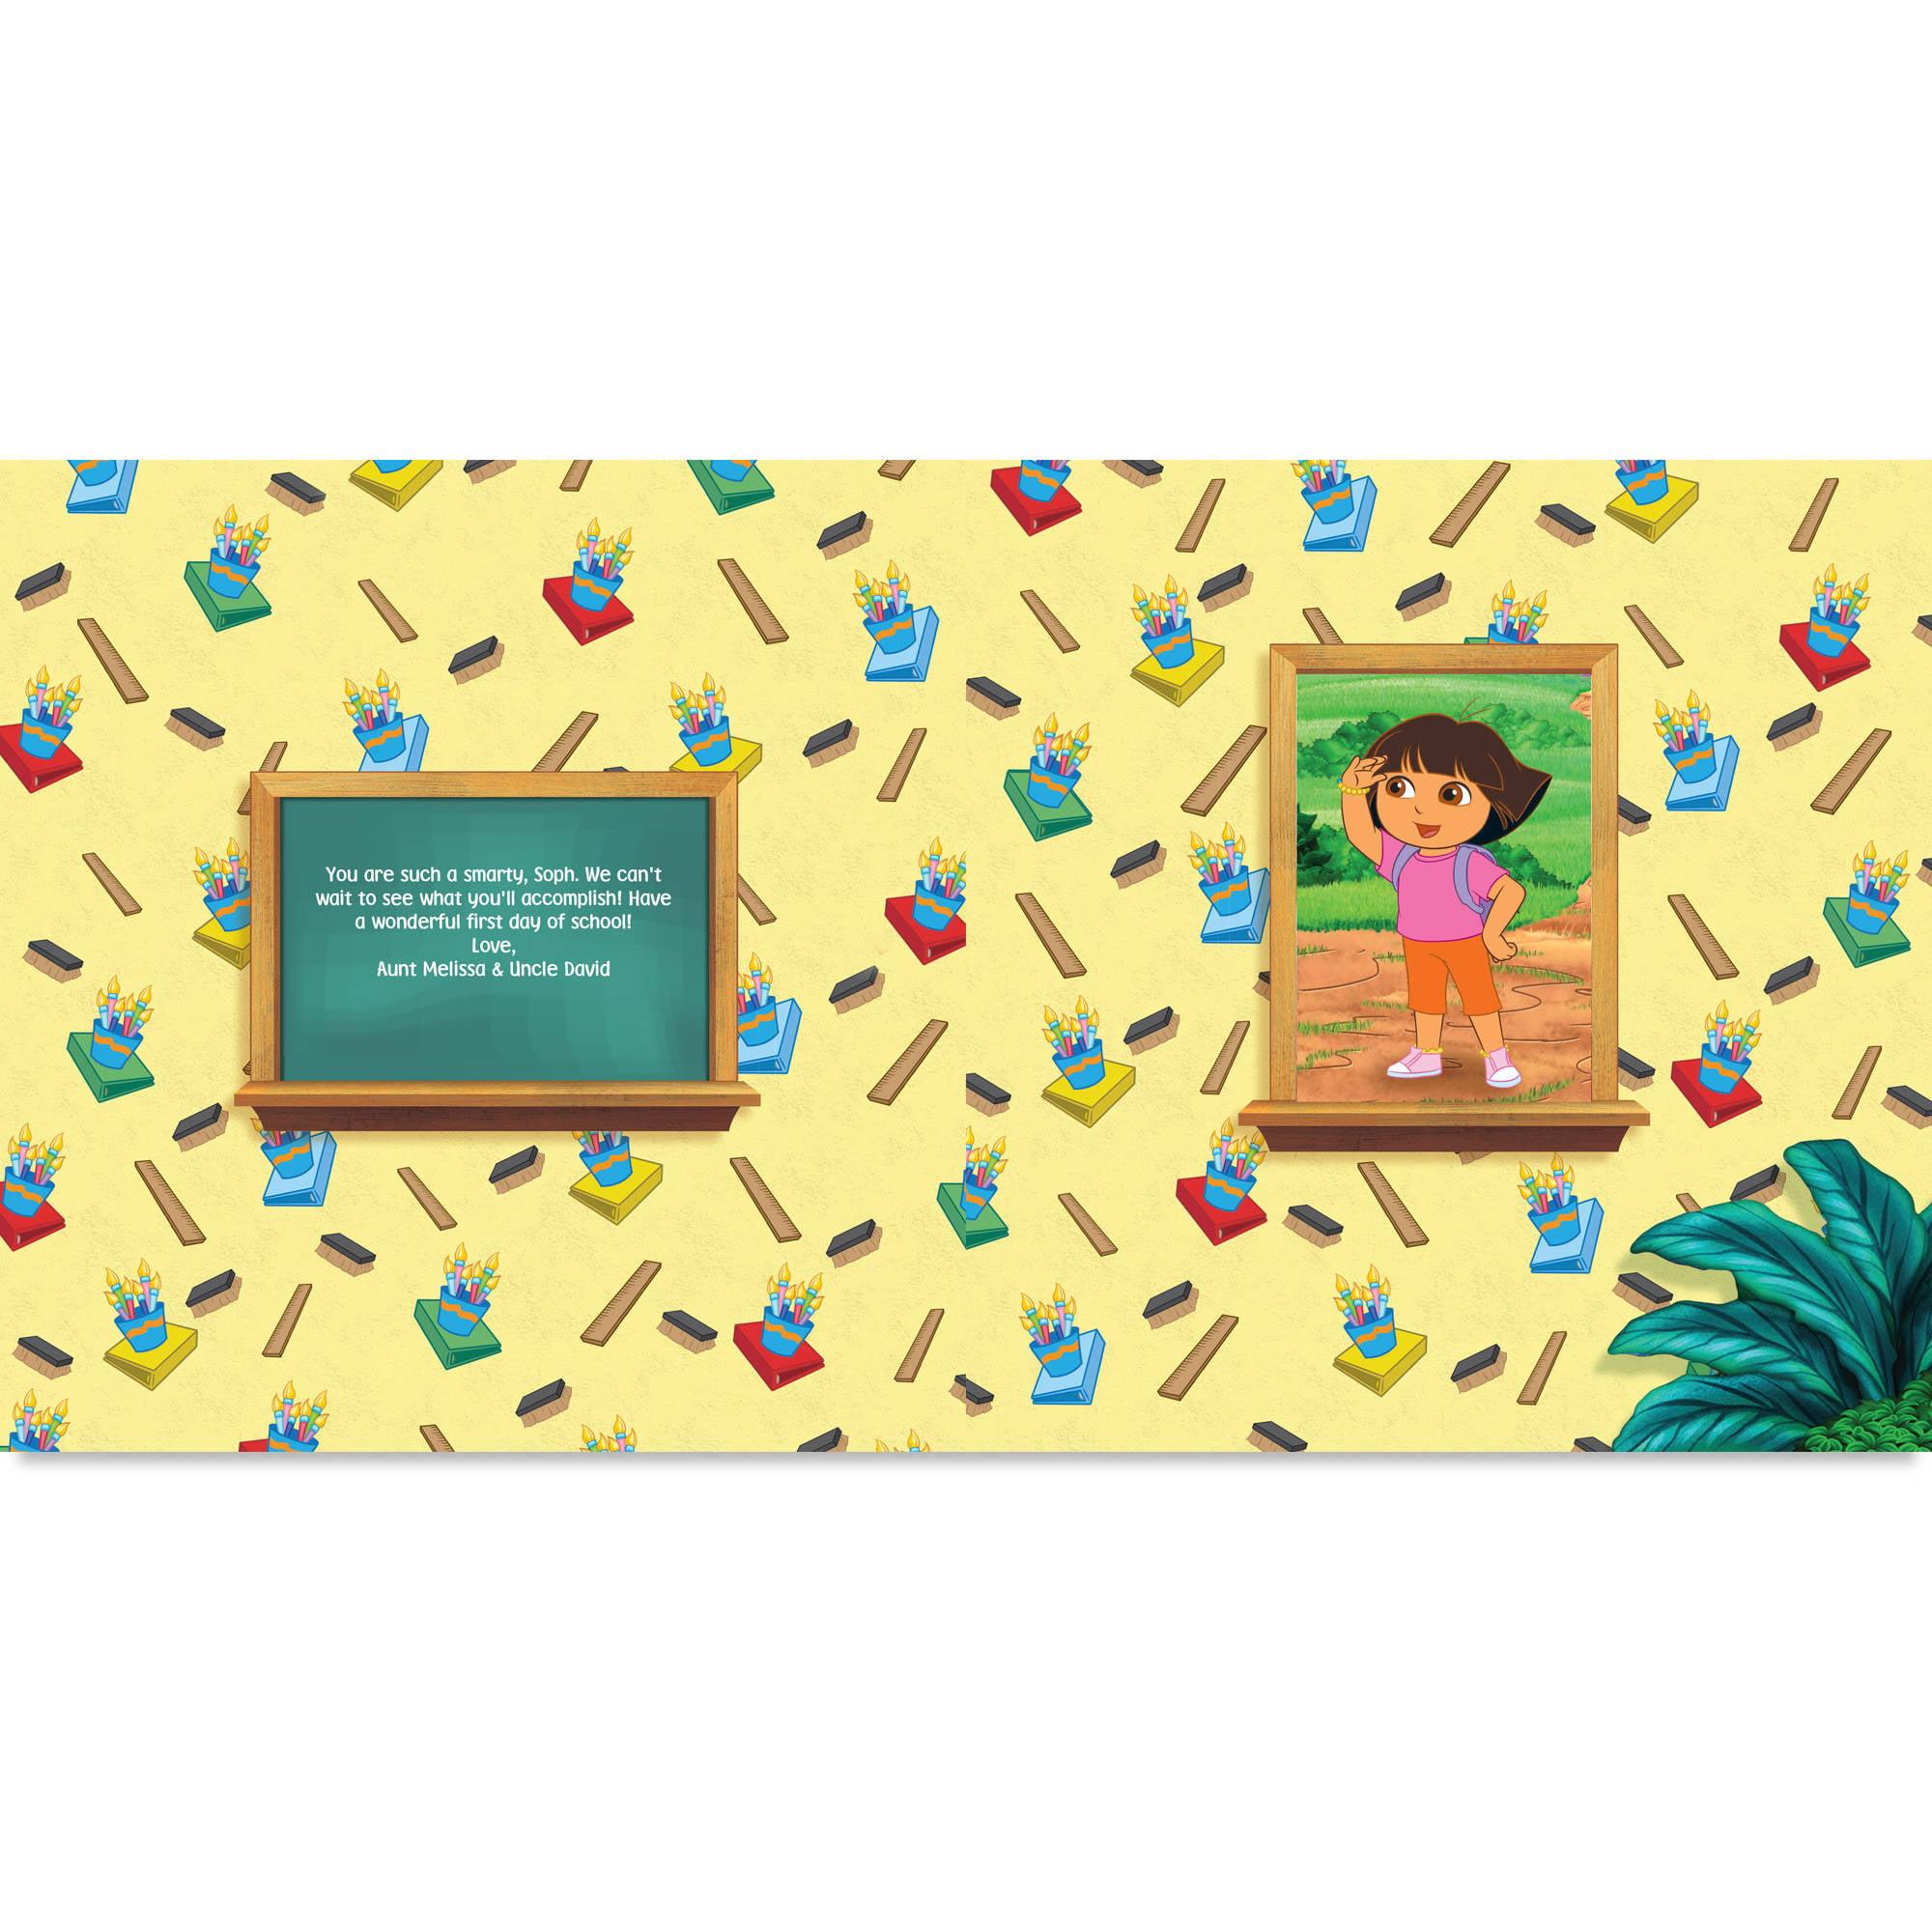 Personalized Book - Dora Goes to School - Walmart.com